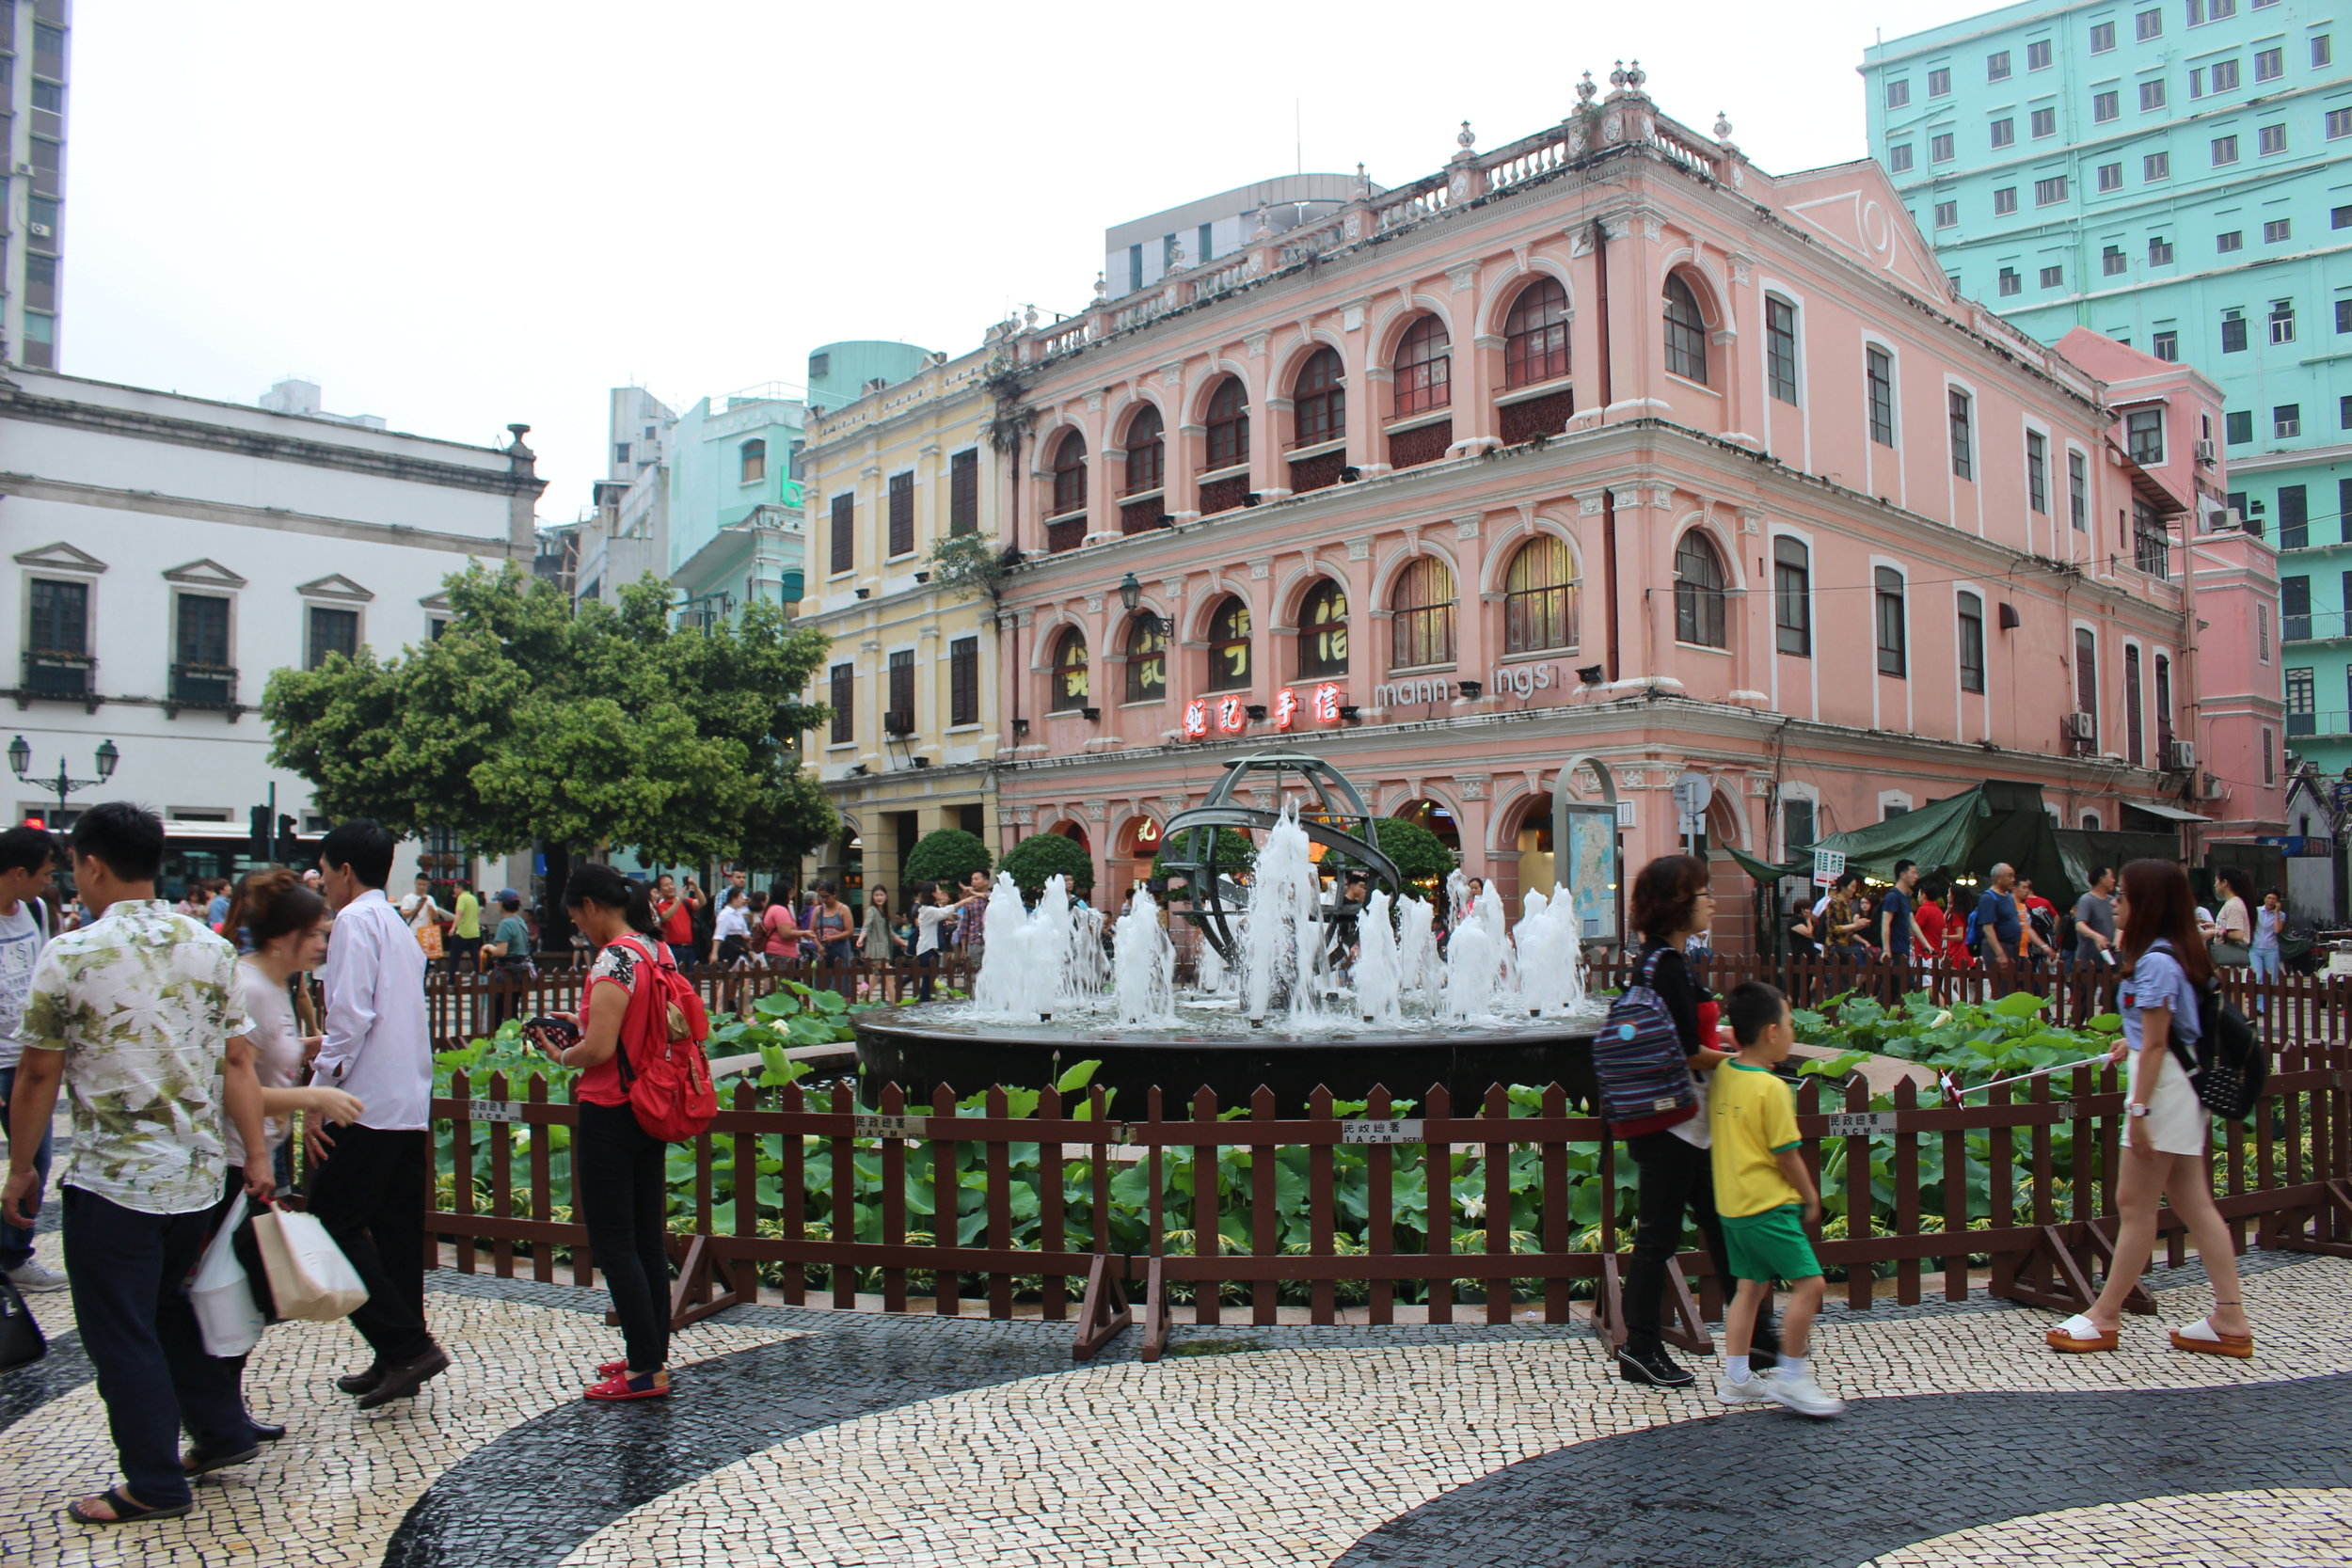 Famous public park in the downtown area